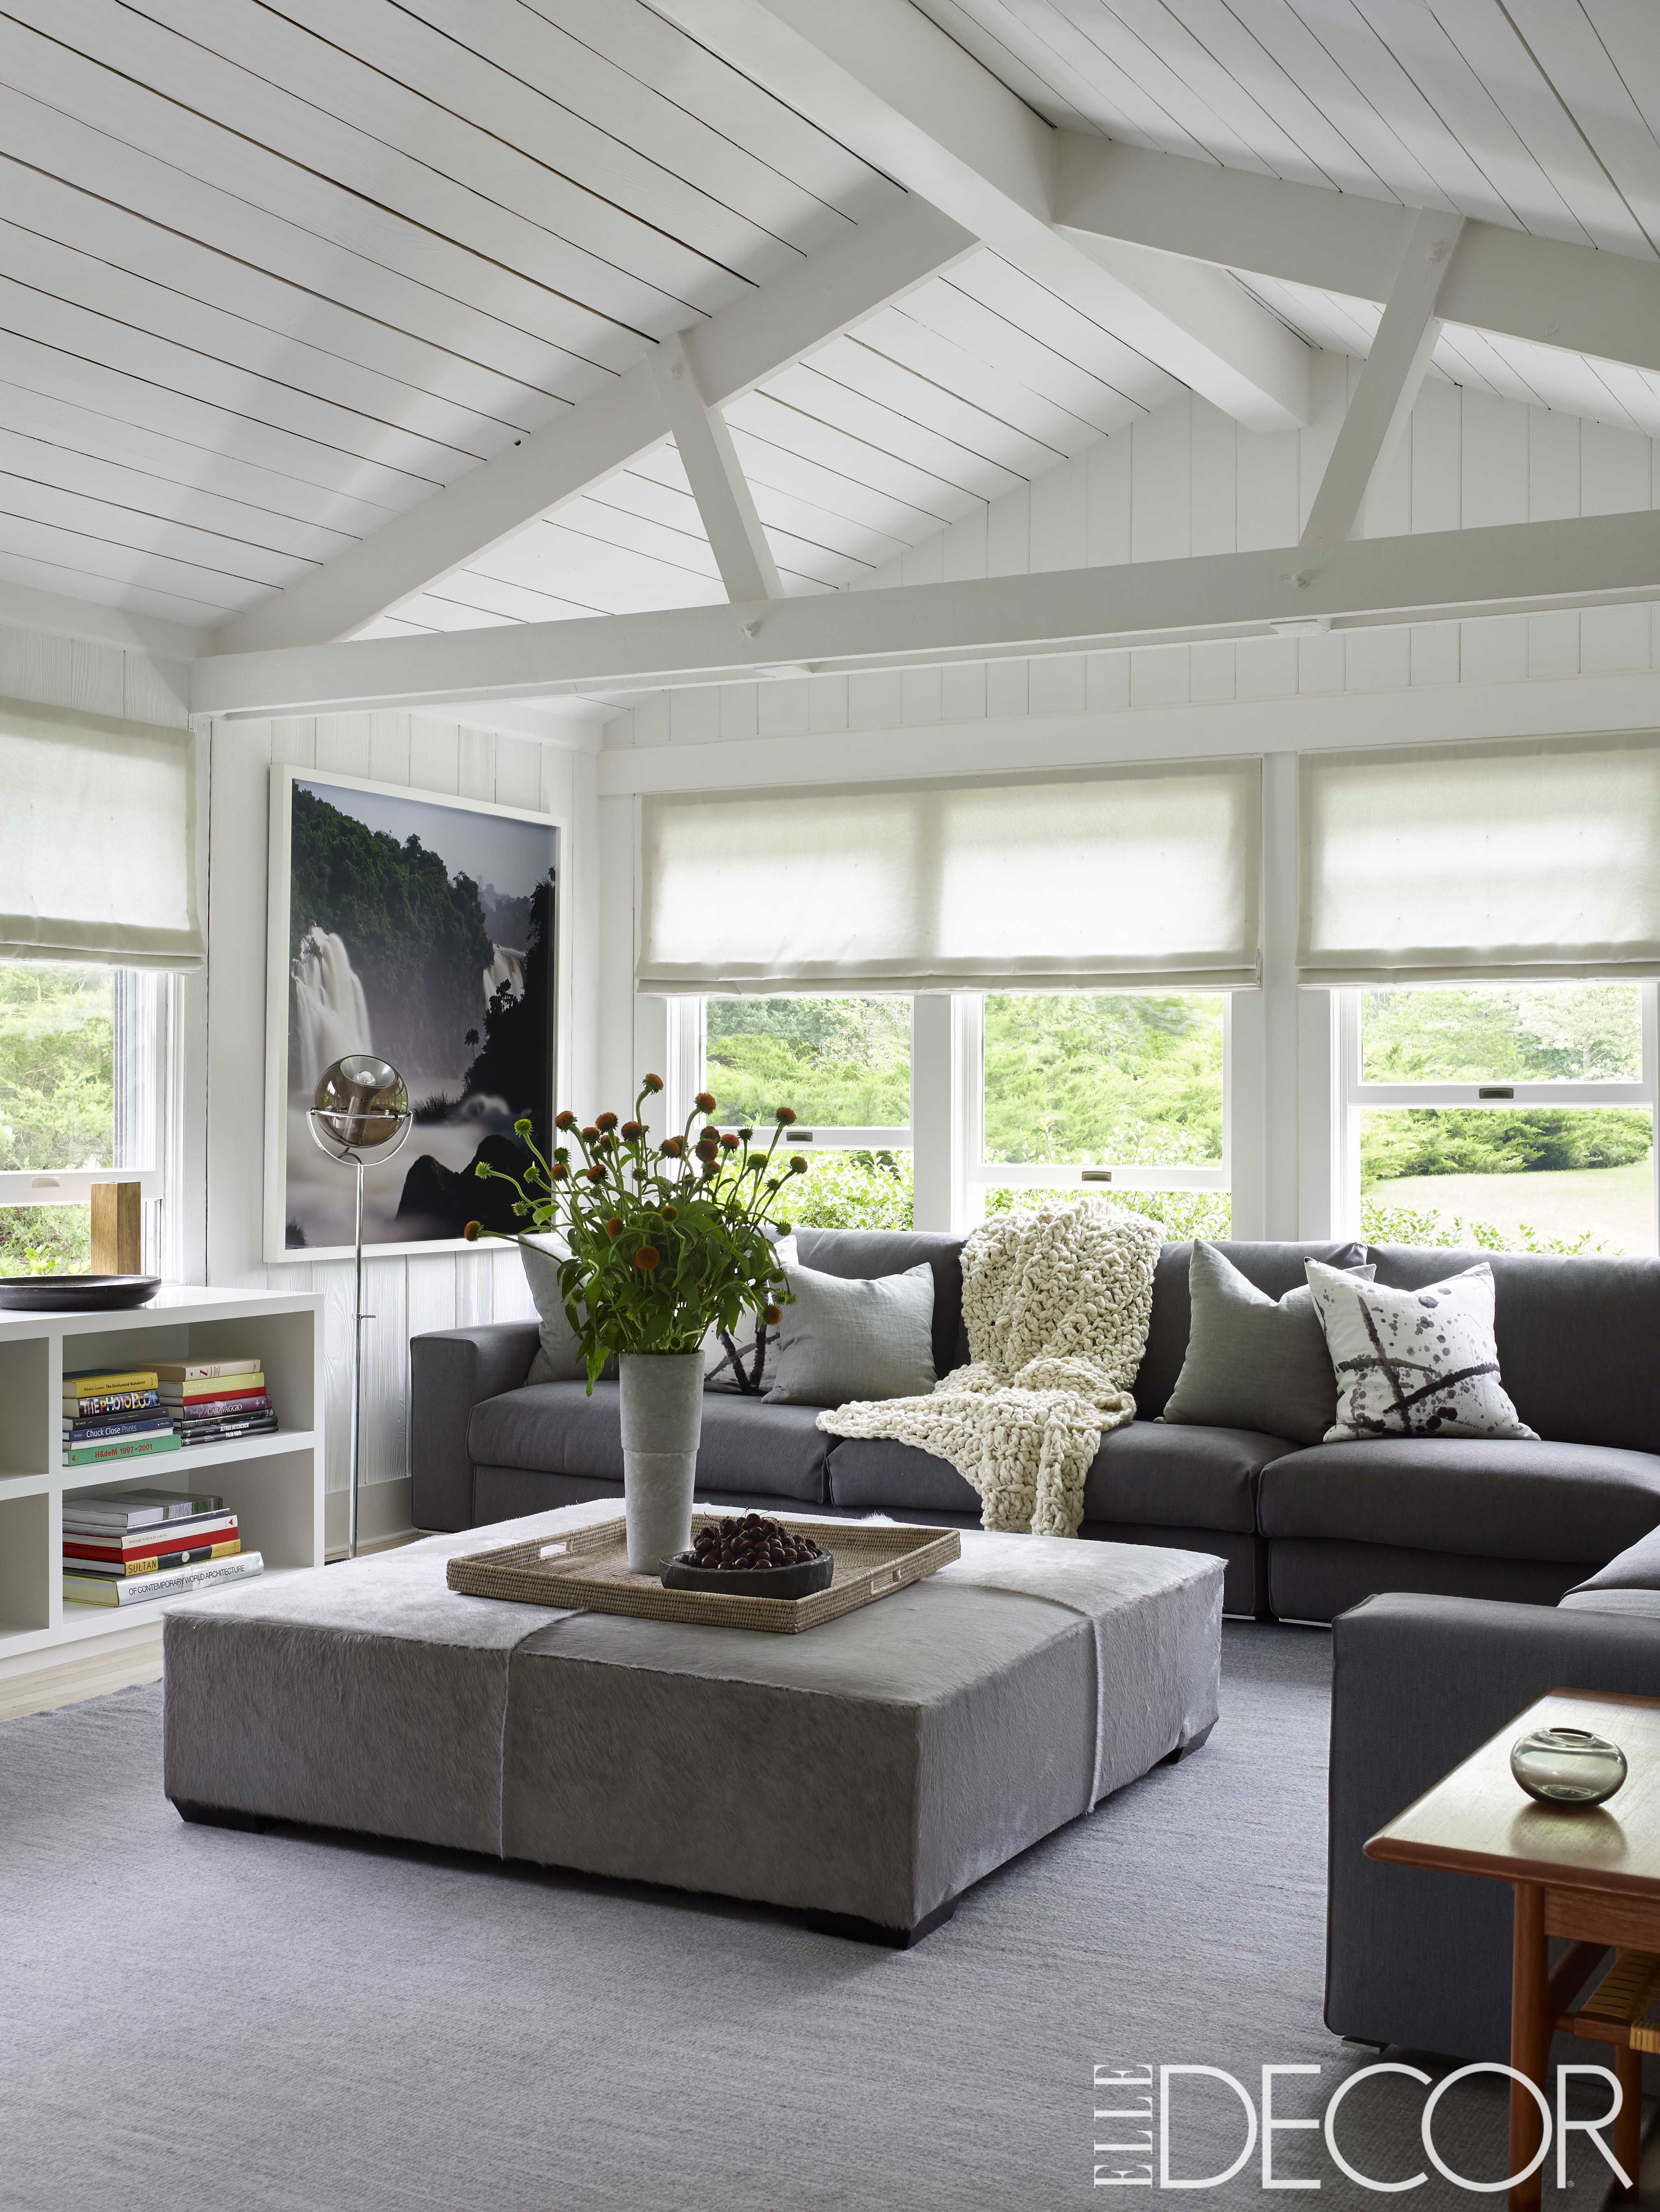 High Quality Best Living Room Ideas   Beautiful Living Room Decor Home Design Ideas